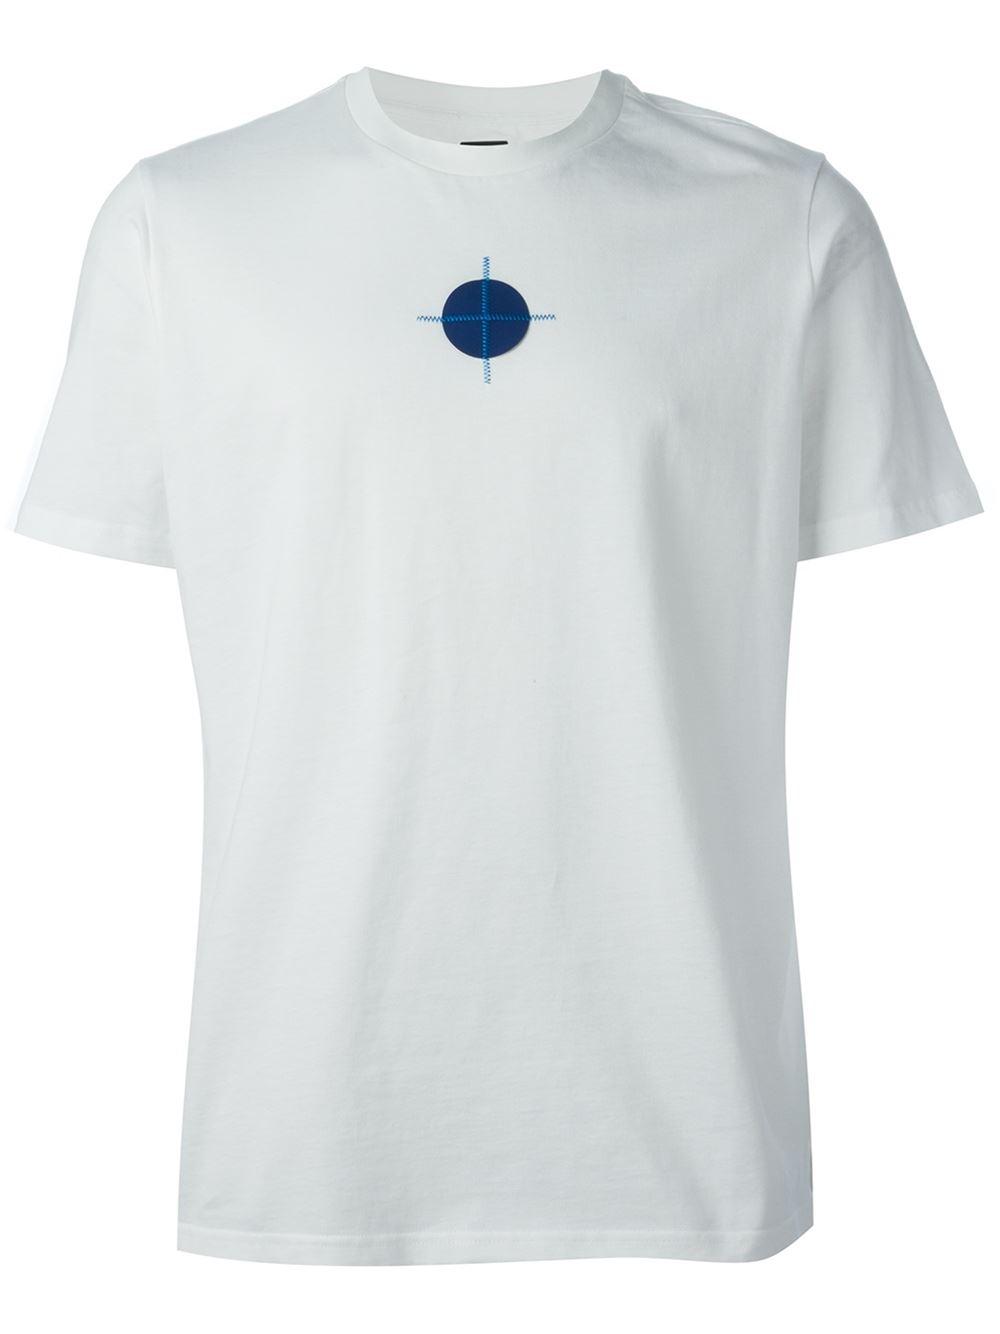 ec7060af7 OAMC White Embroidered Mini Circle T-Shirt for men